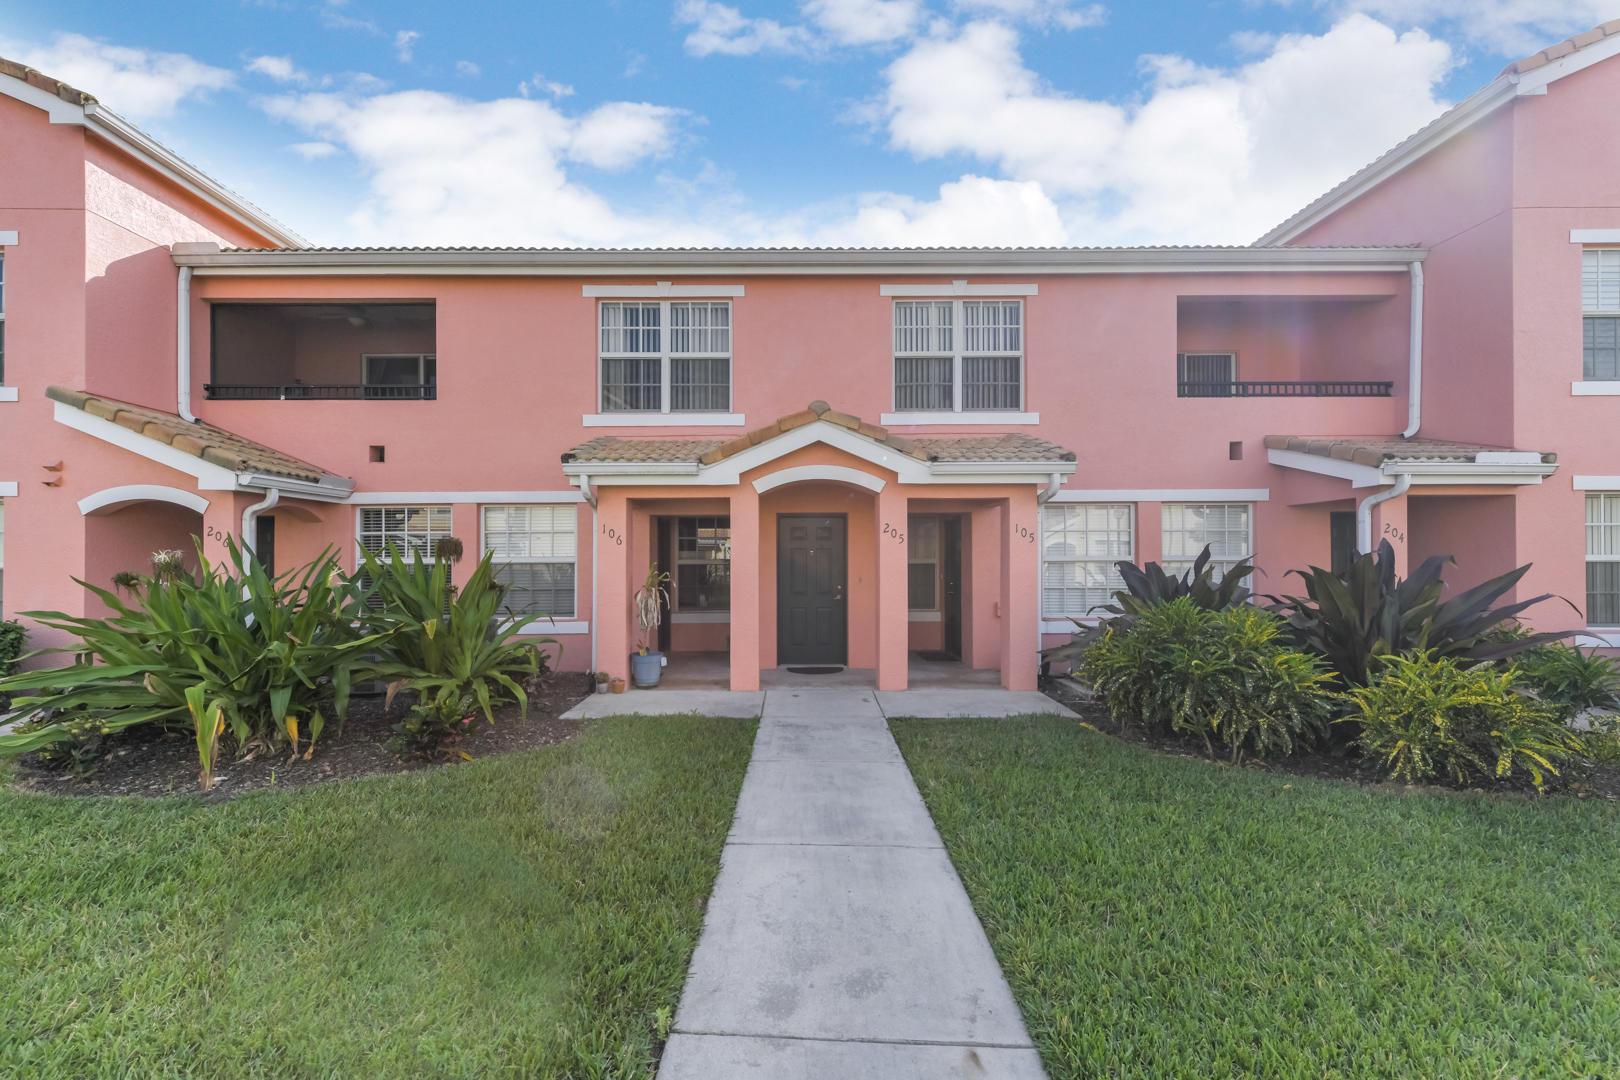 132 SW Peacock Boulevard 17205 Port Saint Lucie, FL 34986